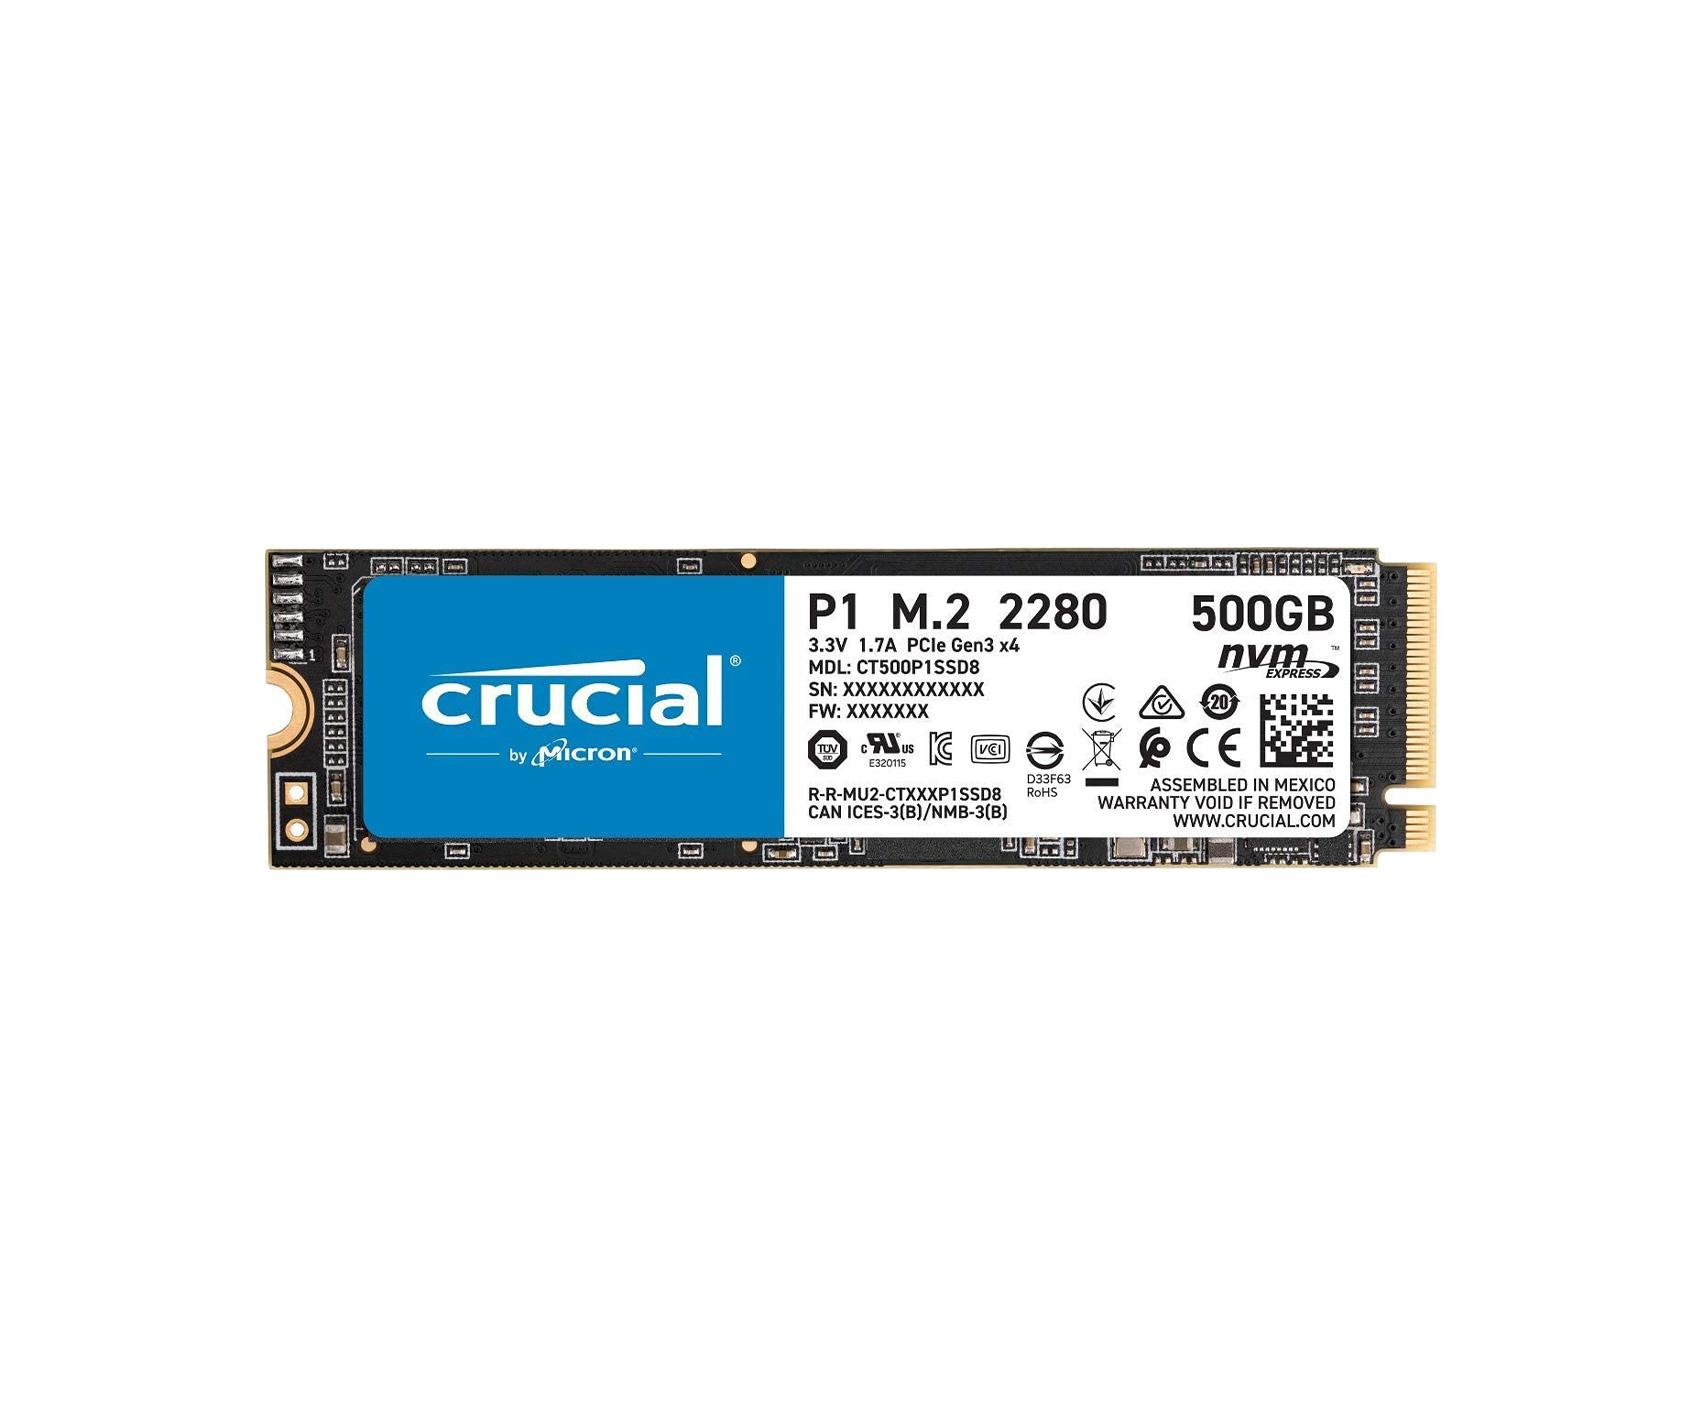 CRUCIAL P2 500GB NVME M.2 SSD